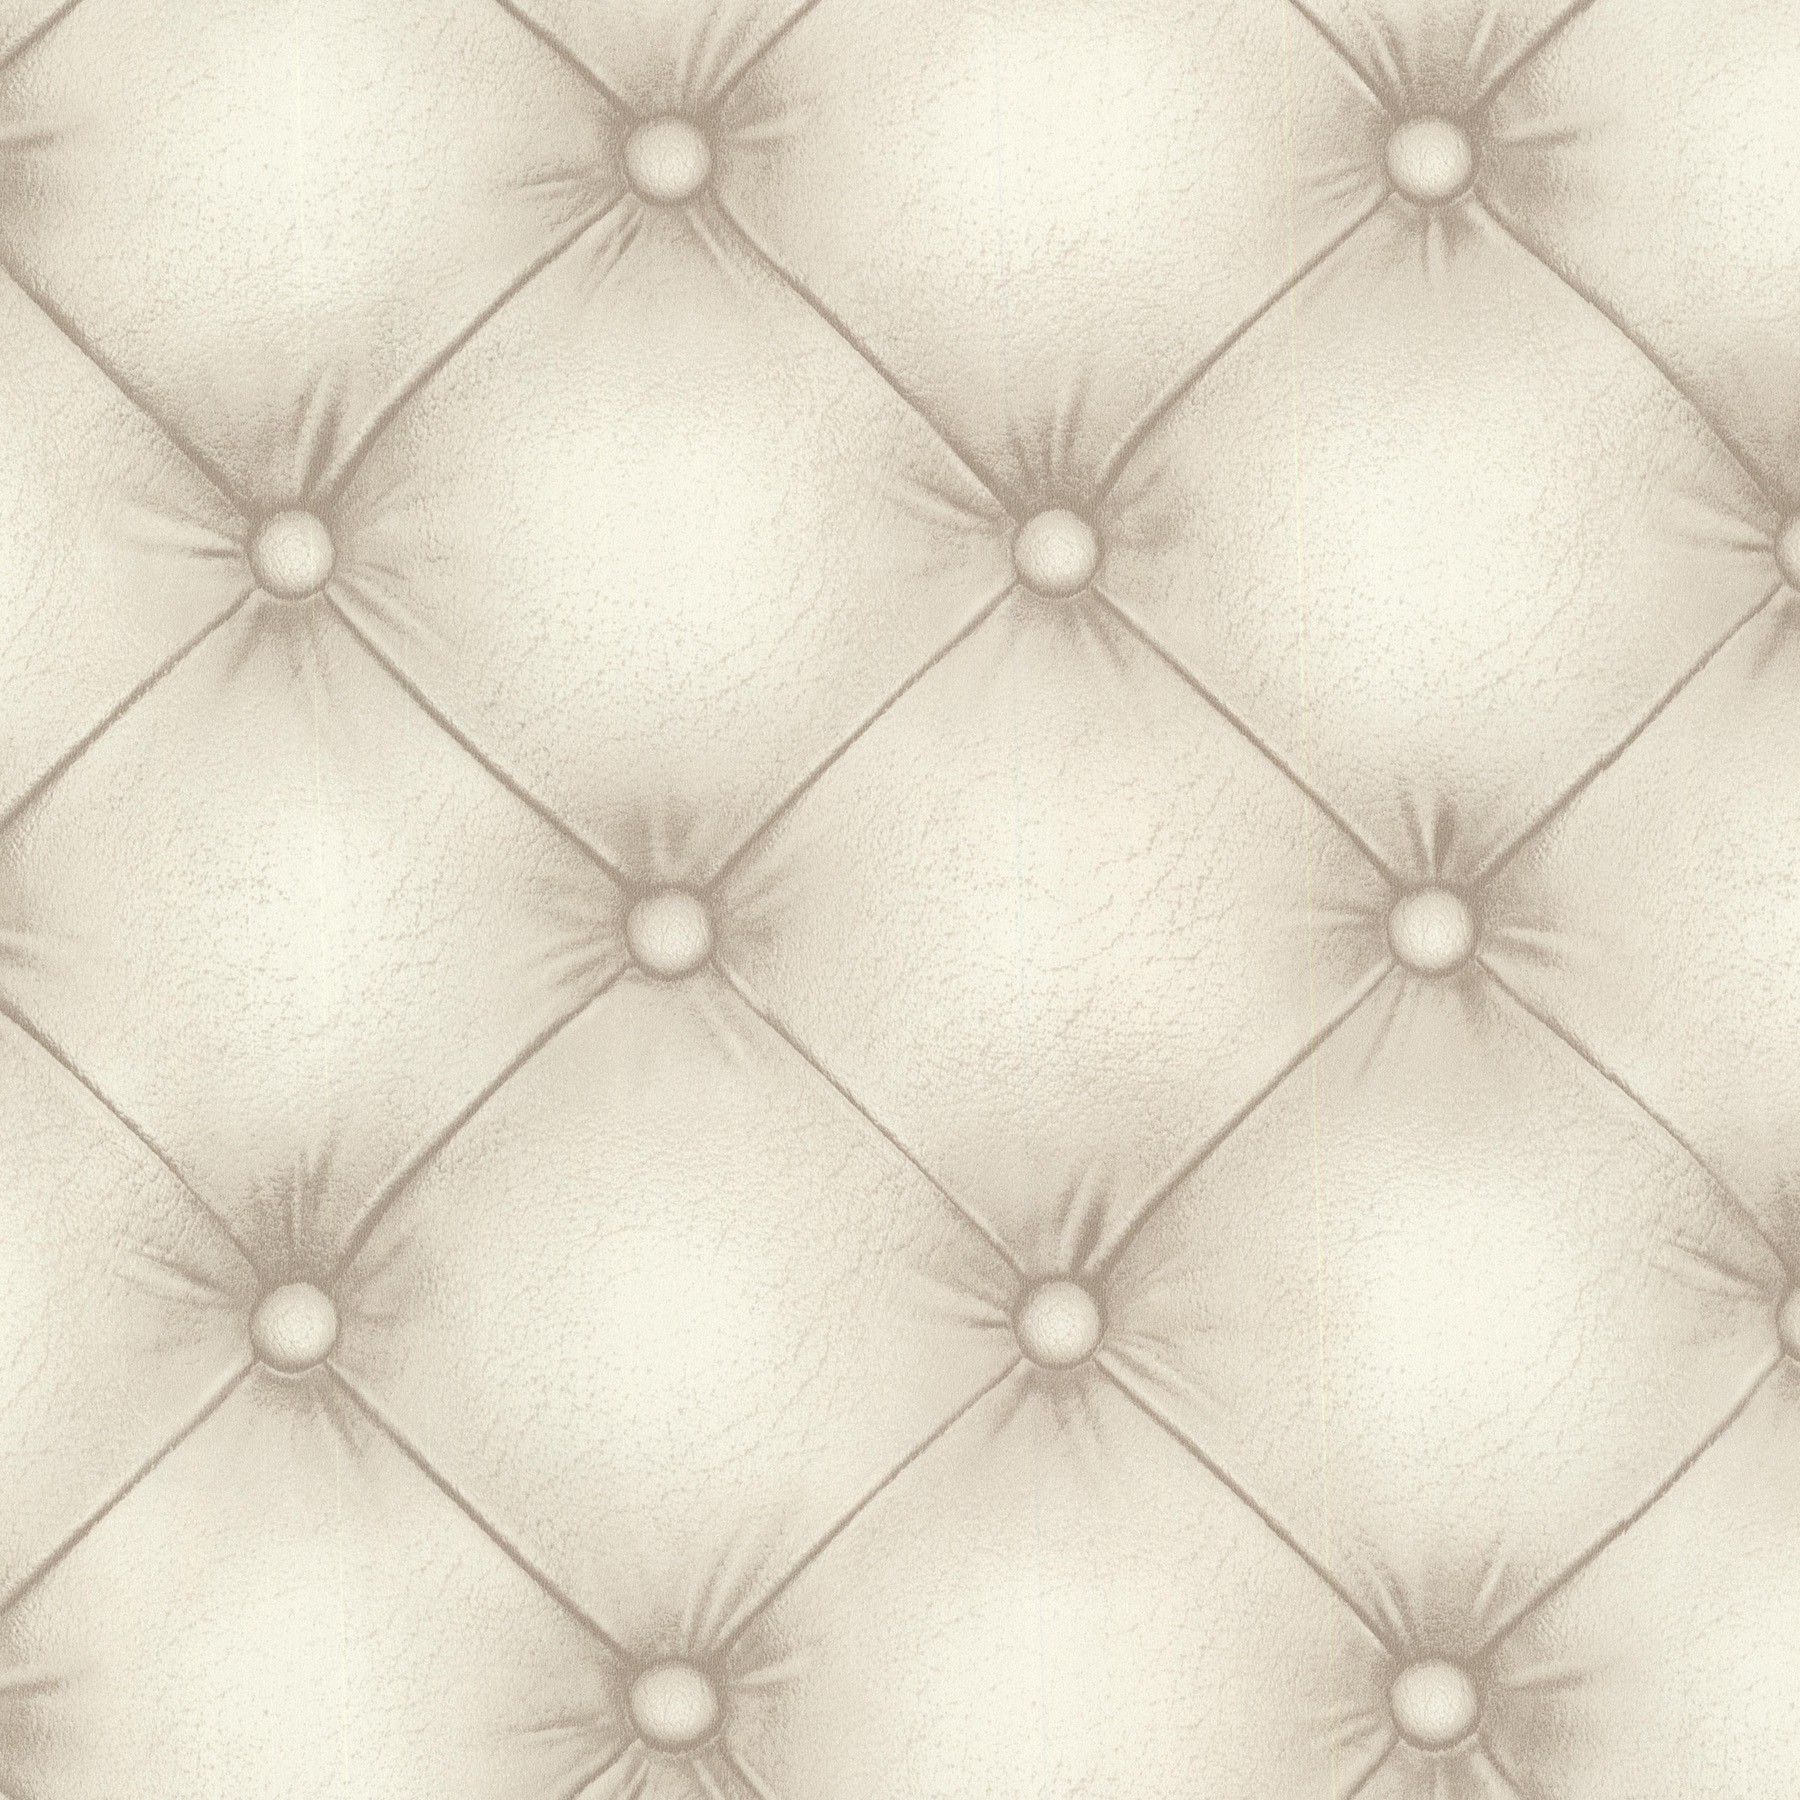 Tapete  Steppmuster  creme  beige  Vliestapeten  R - Knopen Behang